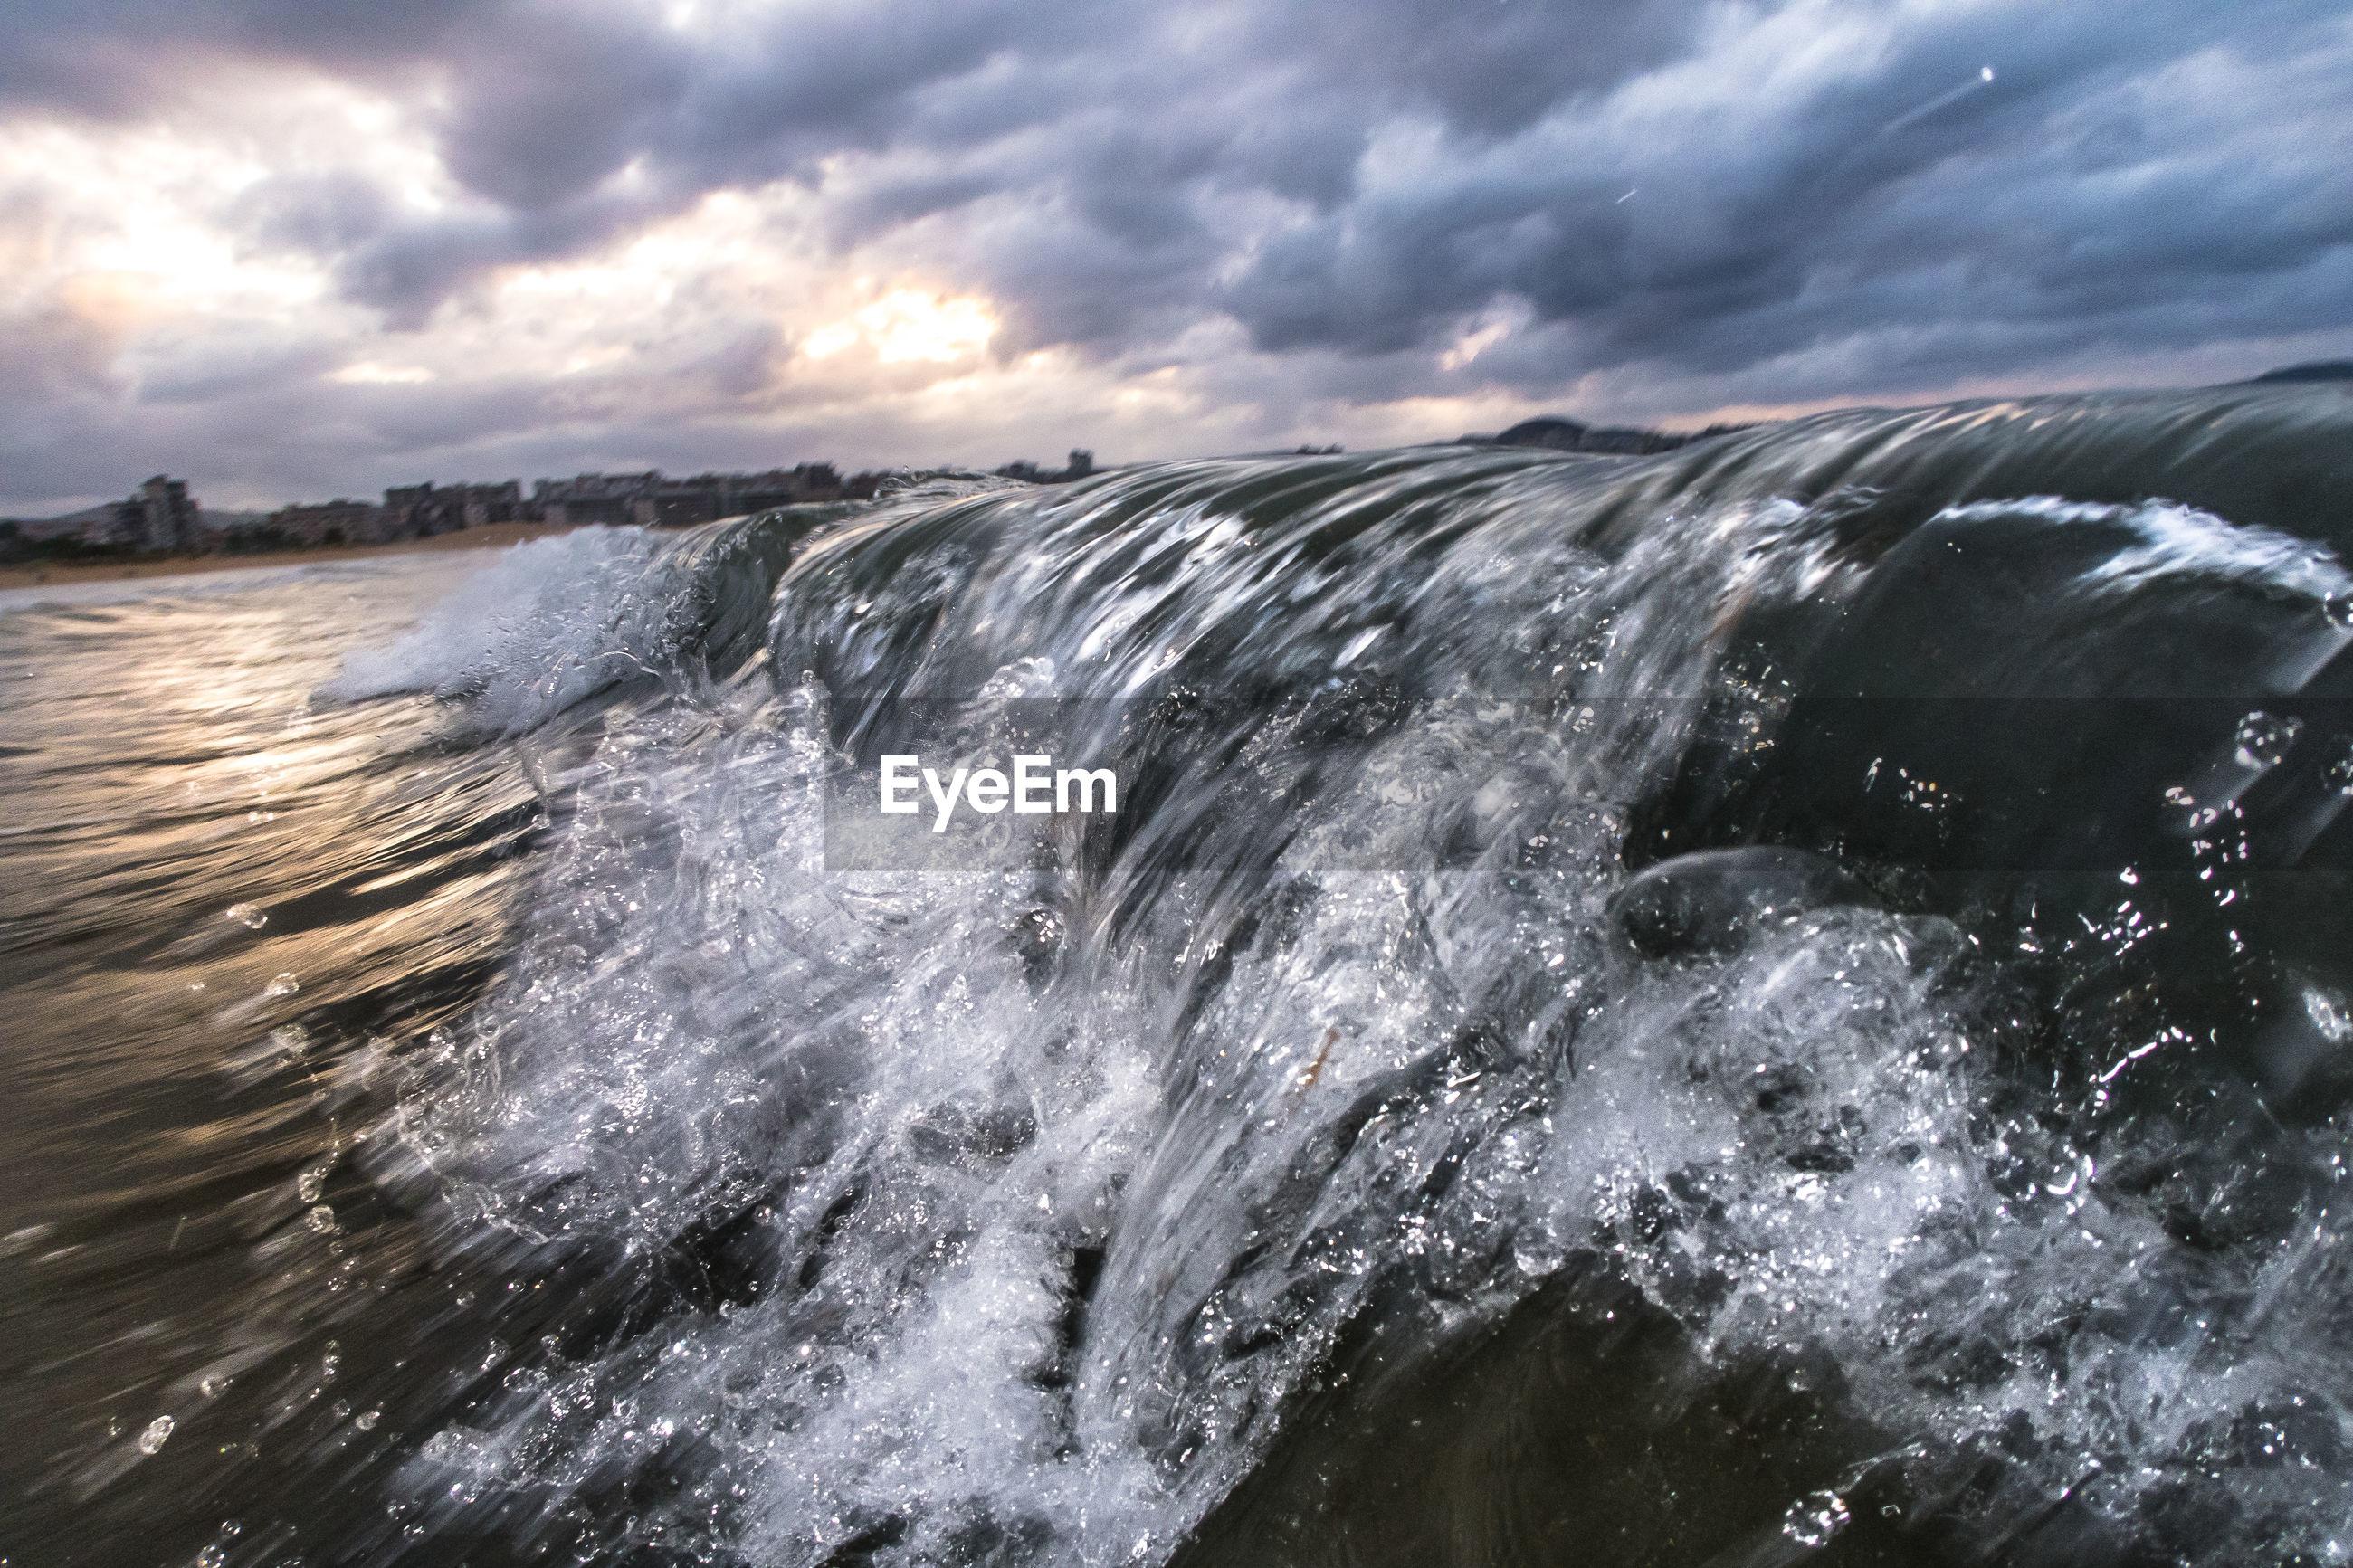 SEA WAVES SPLASHING ON CLOUDY SKY